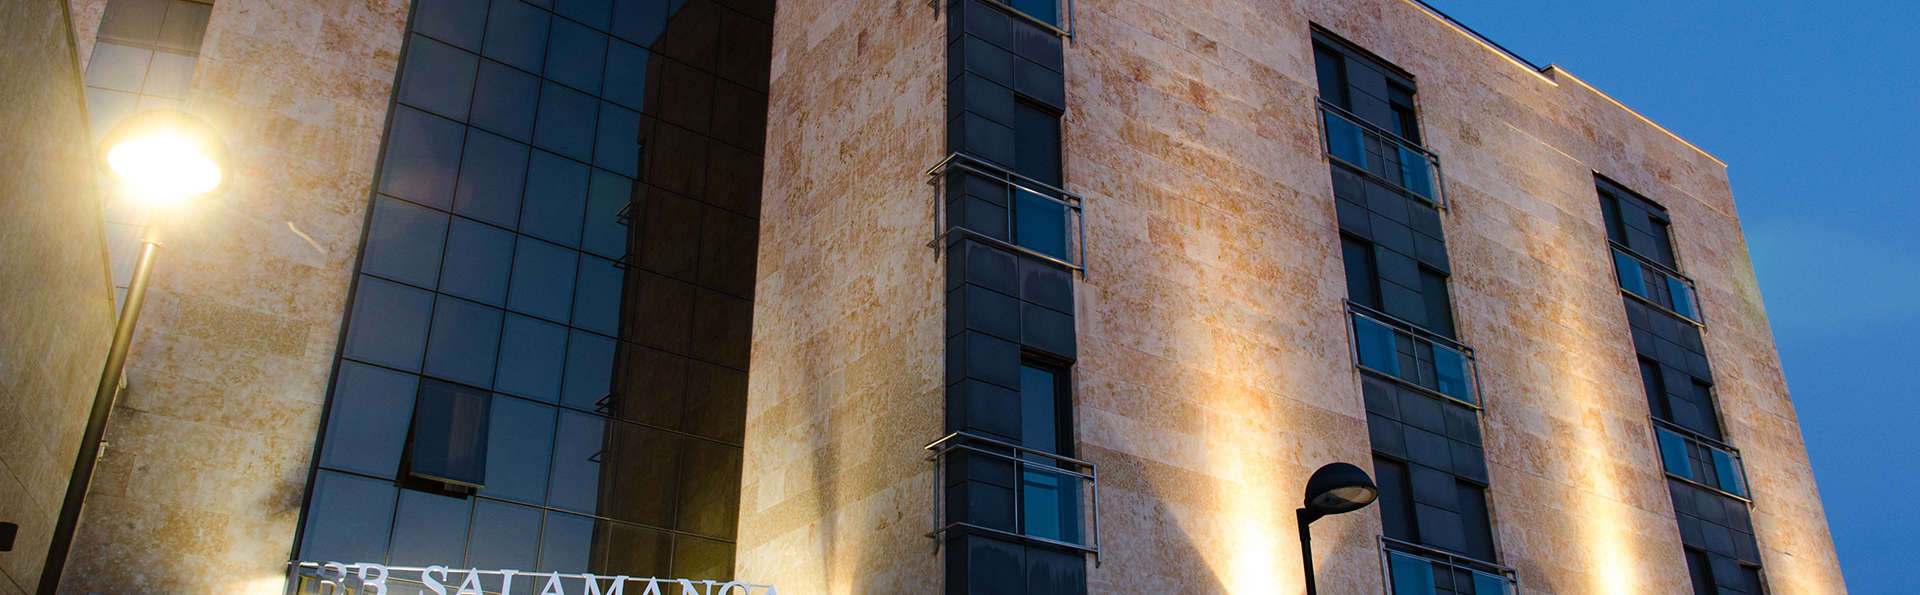 Hotel Ibb Recoletos Coco Salamanca - EDIT_NEW_Front.jpg